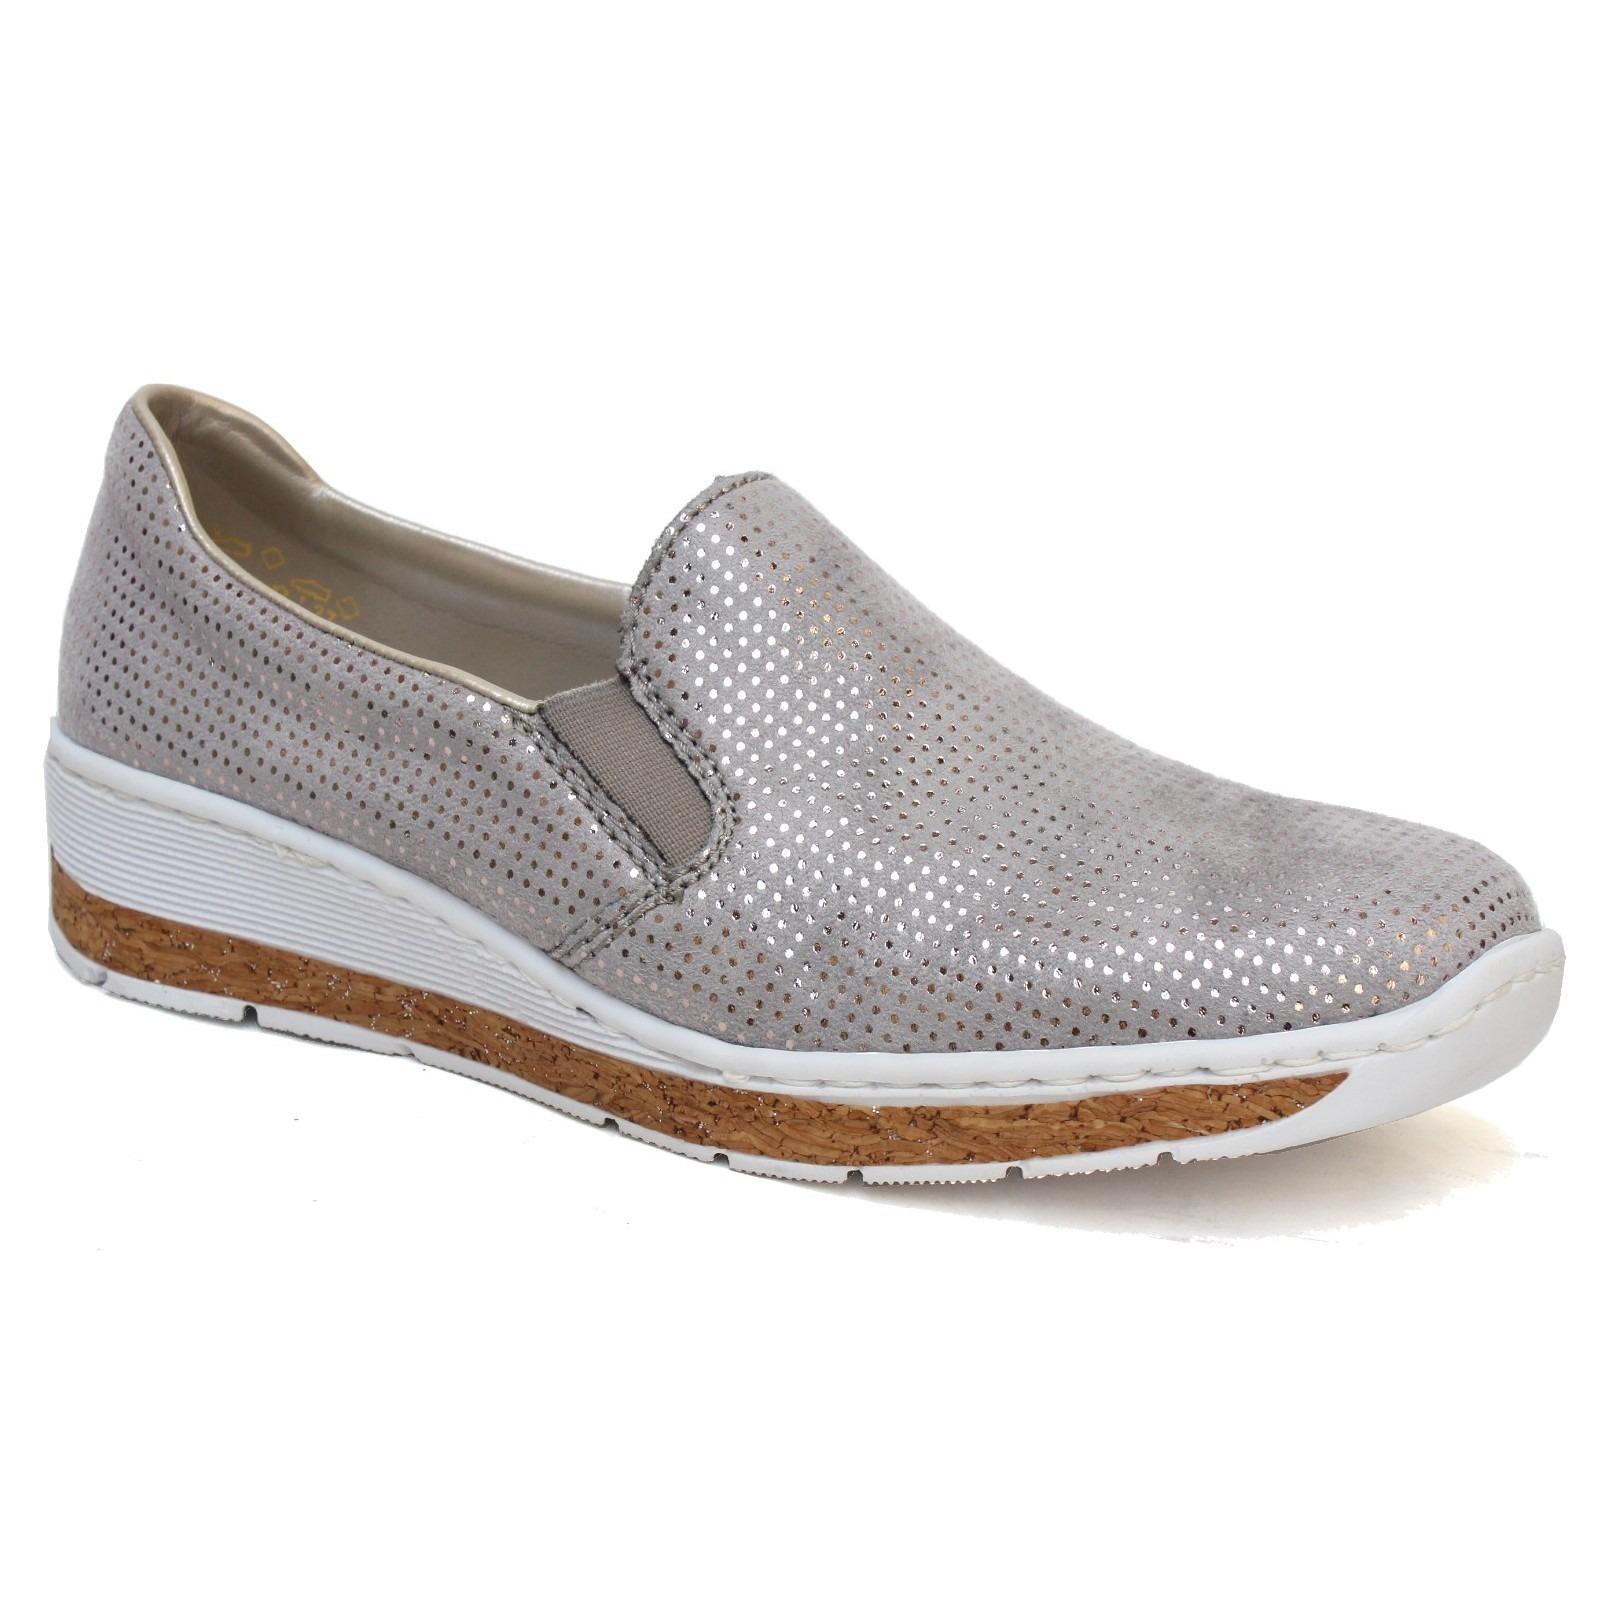 4b938b74e69dc Soňa - Dámska obuv - Mokasíny - Šedé dámske mokasíny značky Rieker